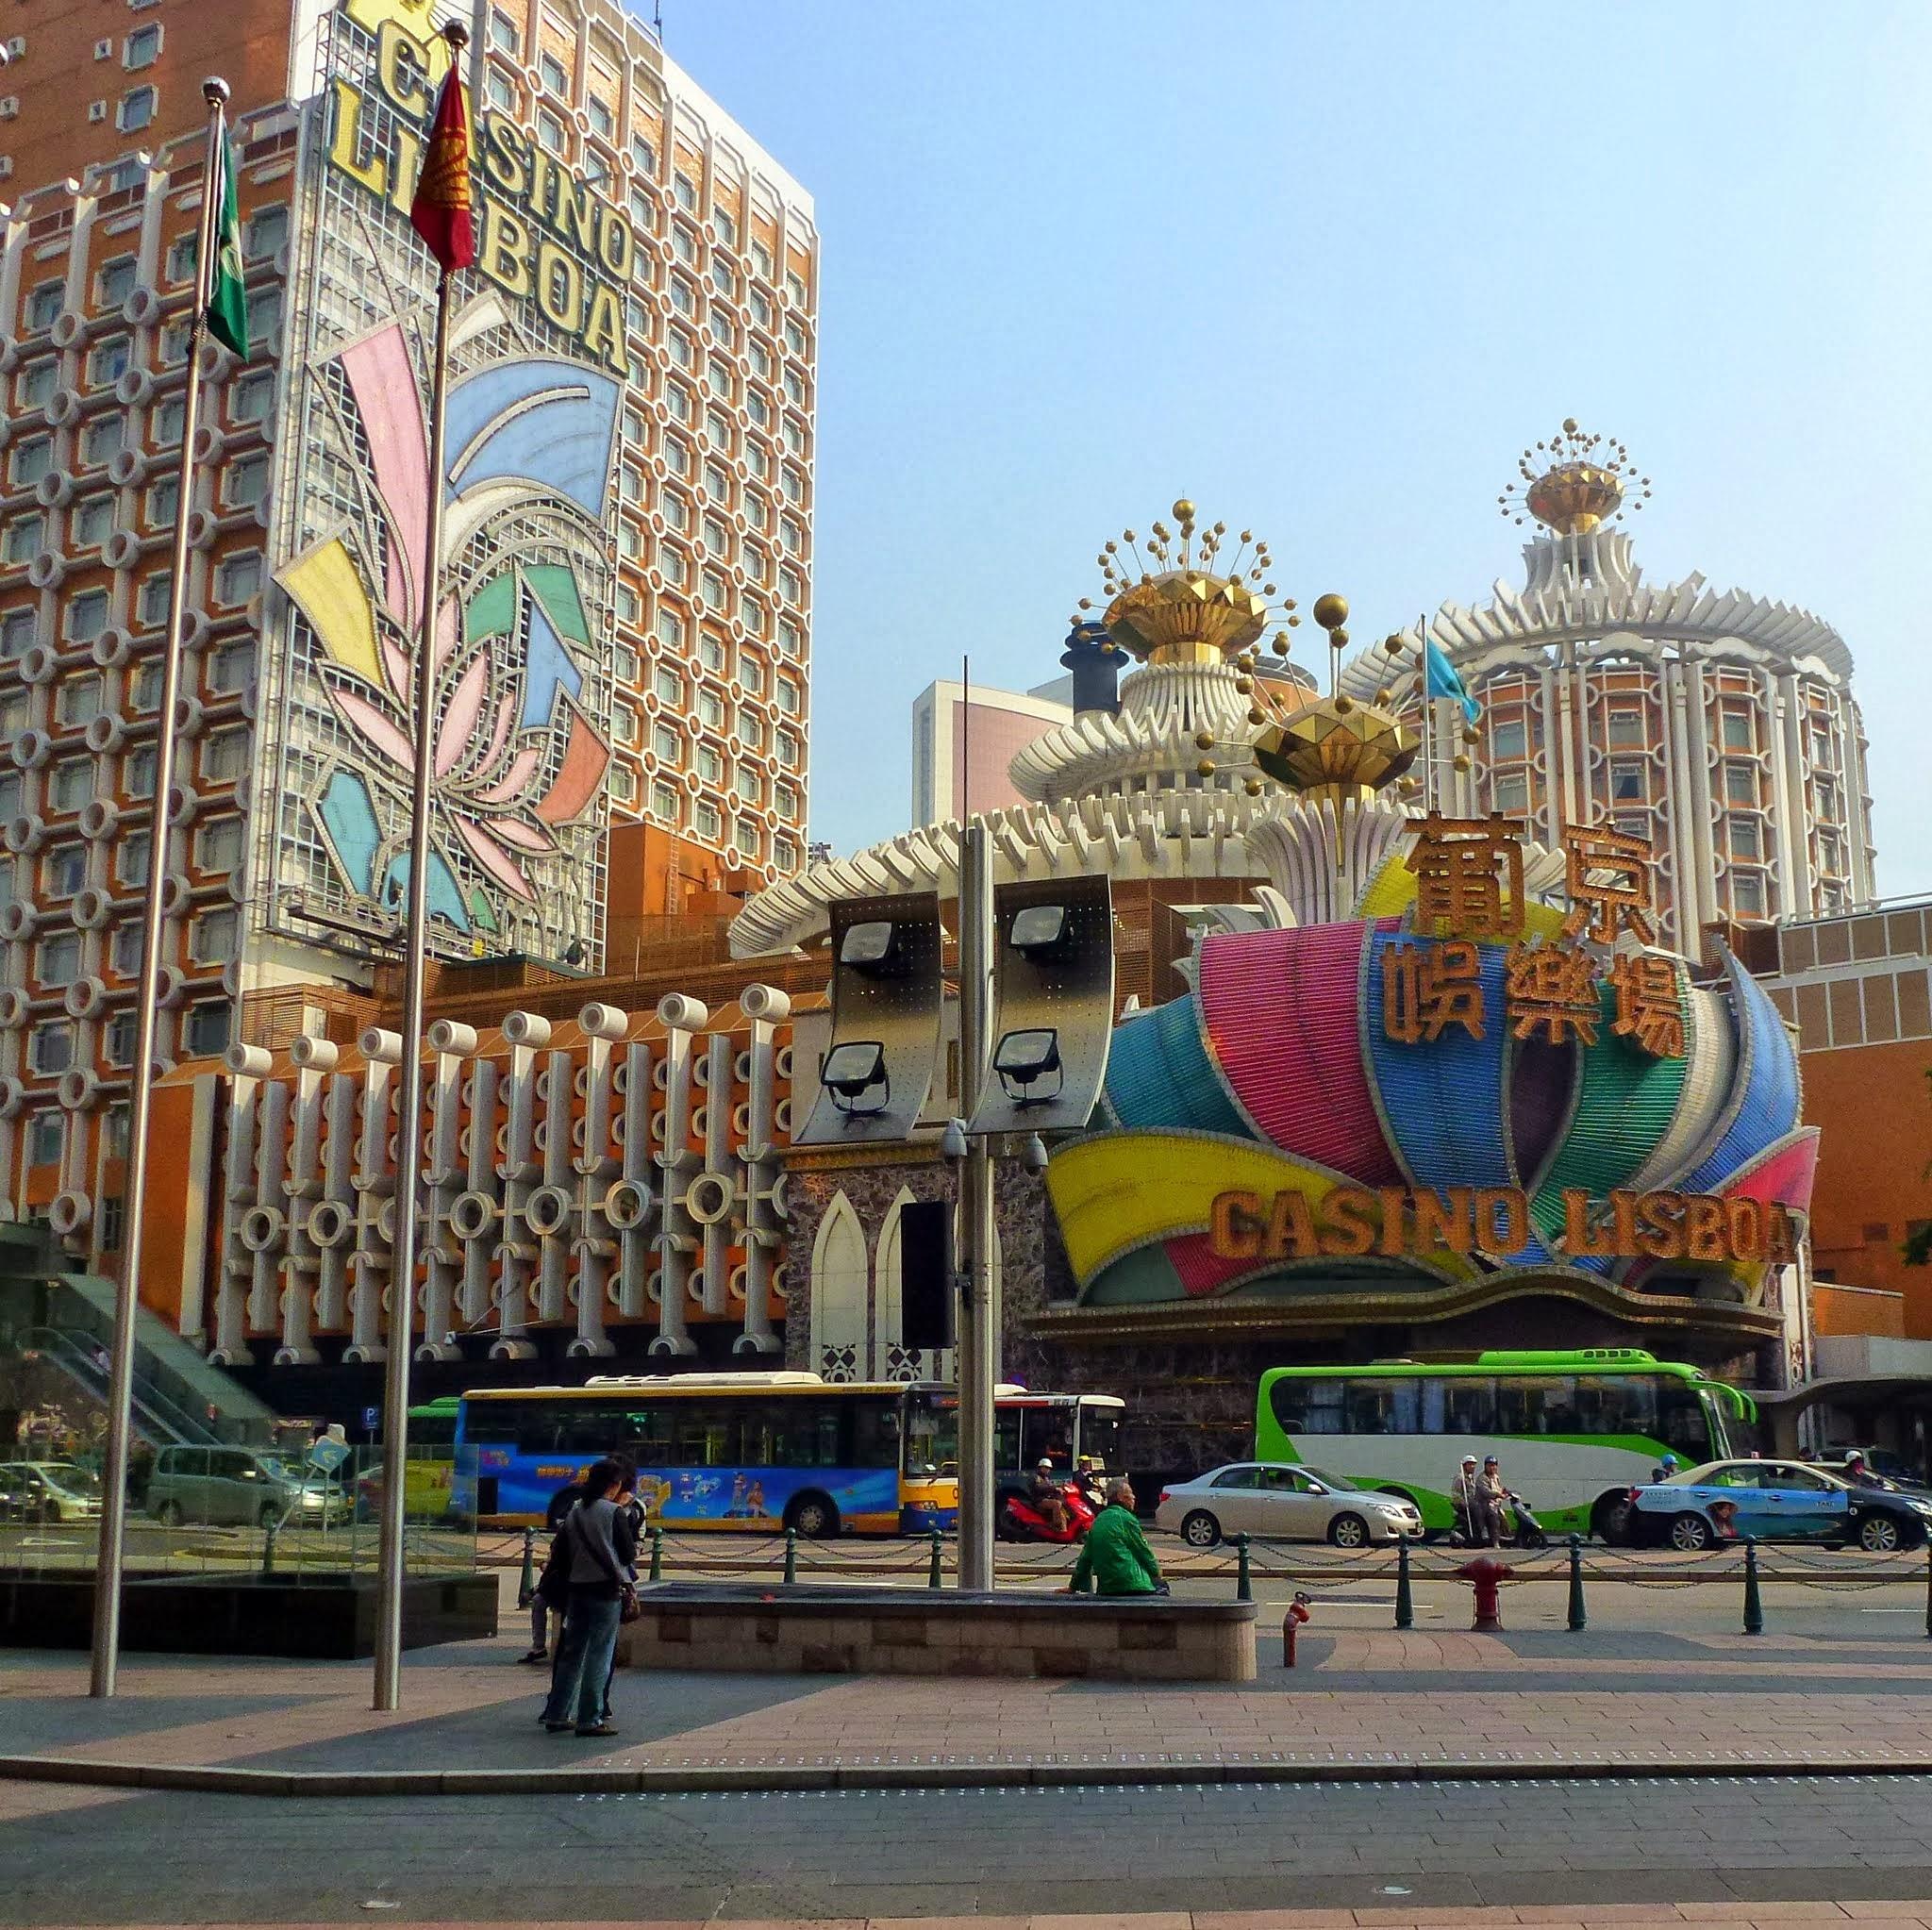 File:Casino Lisboa , Macau - panoramio (1).jpg - Wikimedia Commons